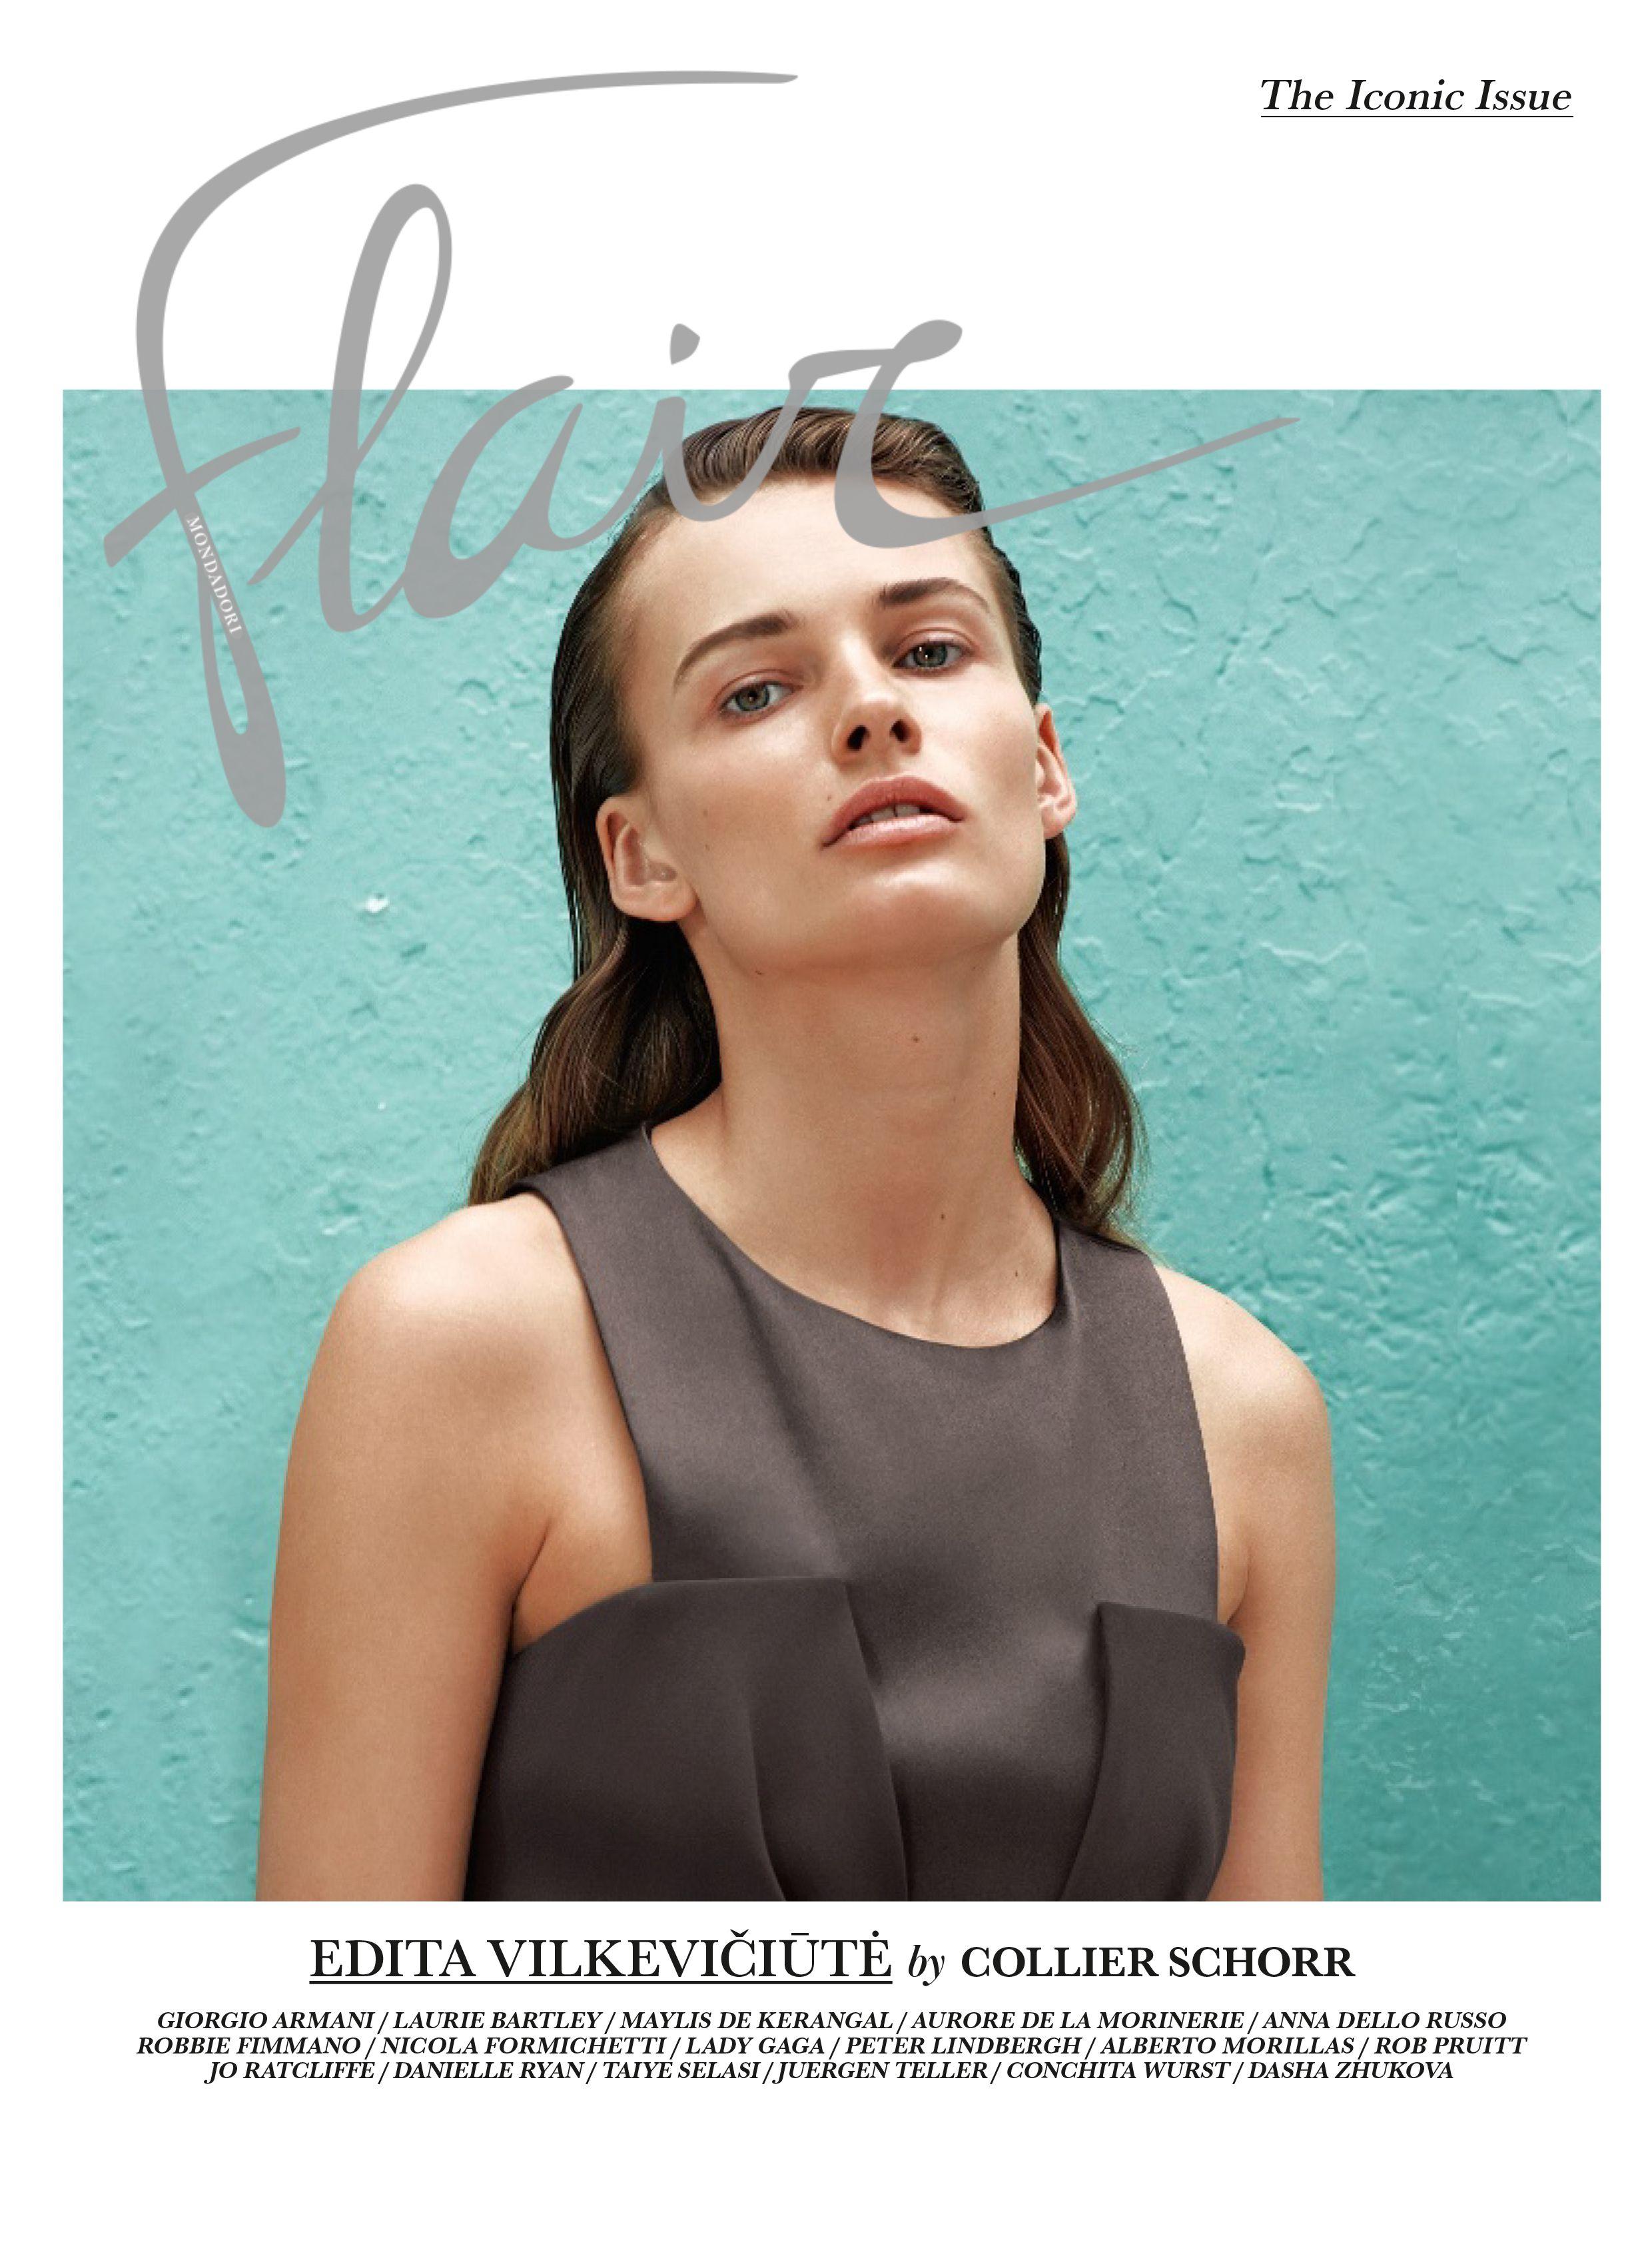 Edita Vilkevičiūtė on the cover of Flair Italia No. 17 - The Iconic Issue wearing a #GiorgioArmani dress. Make up: on skin, Crema Nuda Fair Glow; on eyebrows, Eye & Brow Maestro Ambre by #ArmaniBeauty